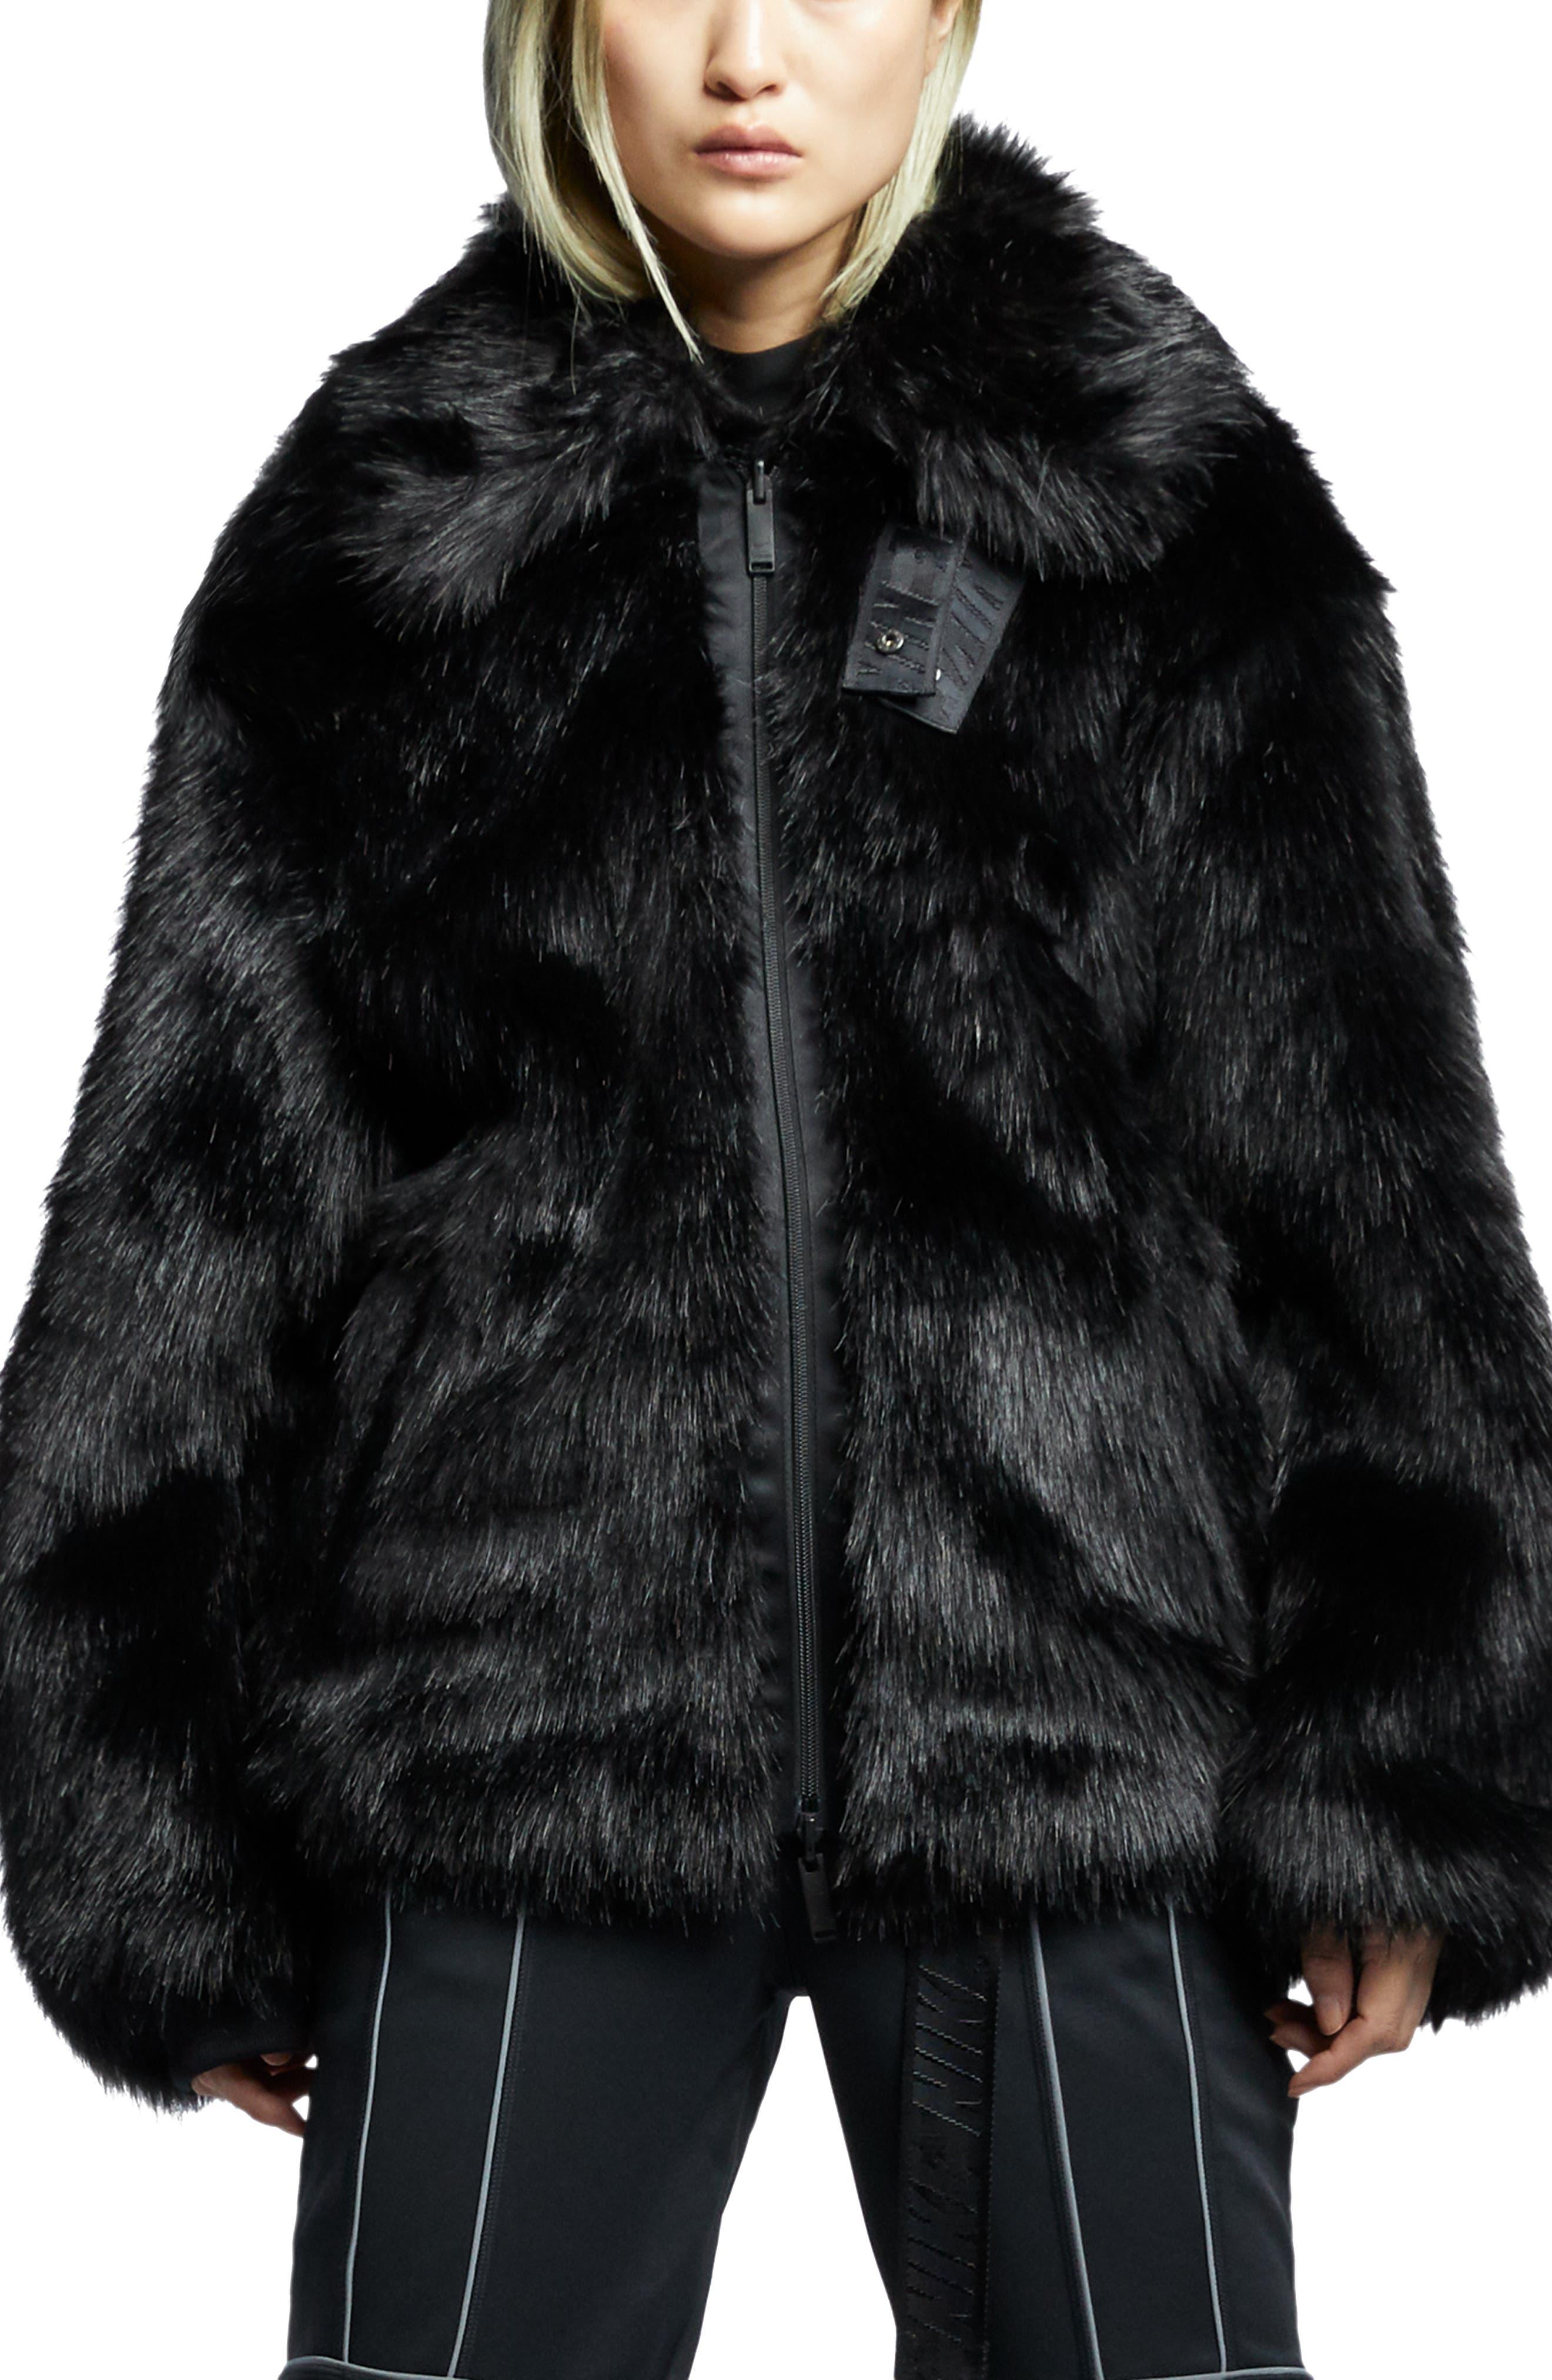 NIKE x Ambush Women's Reversible Faux Fur Coat, Main, color, 010